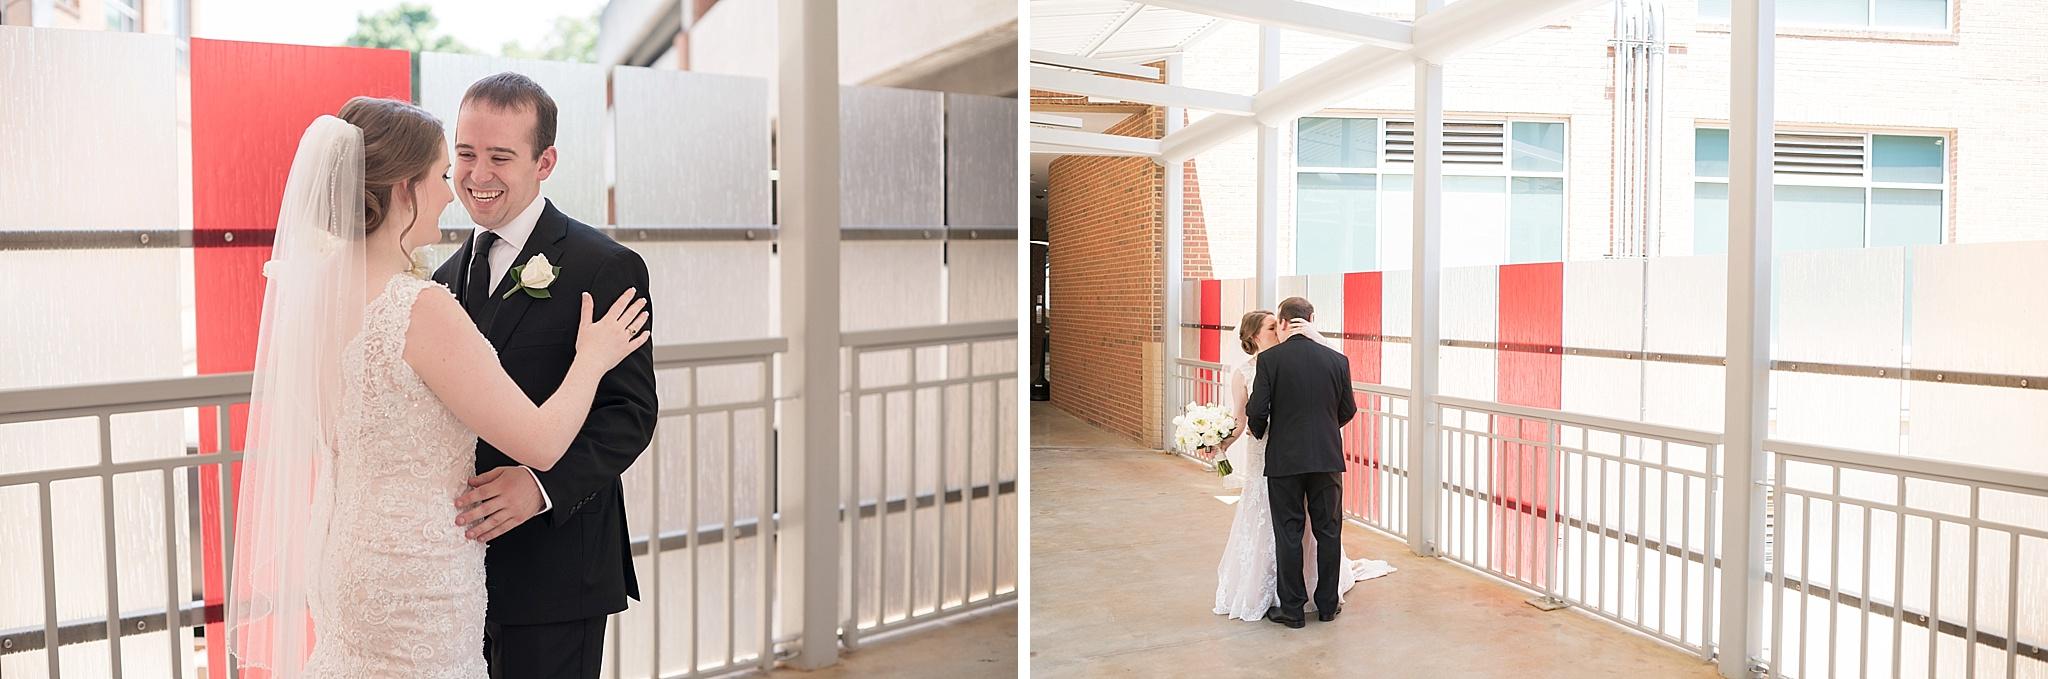 Pavilion-Carriage-Farms-Wedding-Photographer-180.jpg